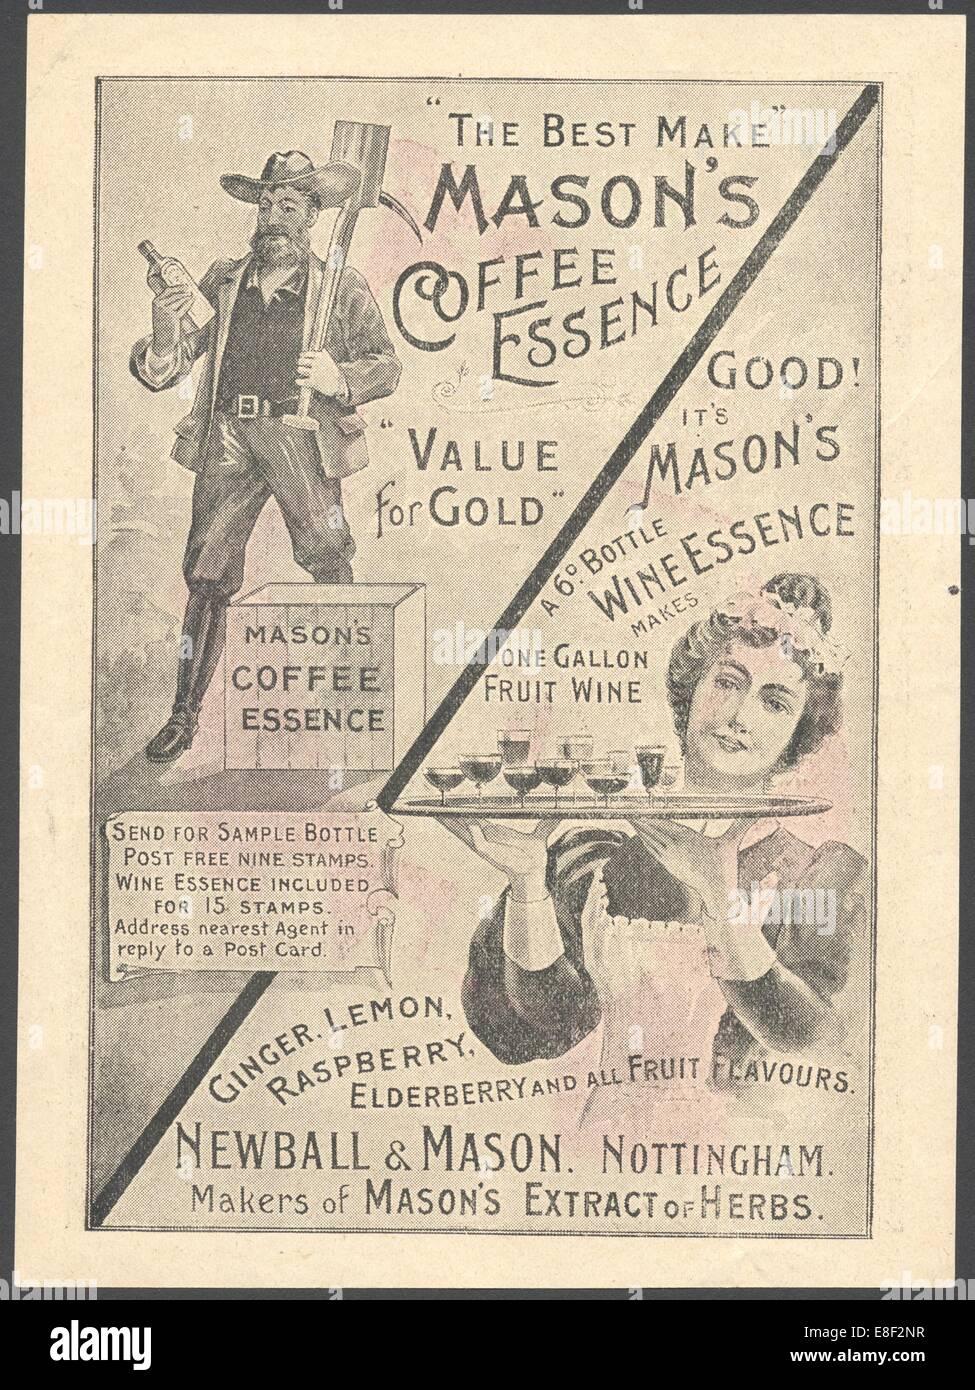 Newball & Mason Essenza di Caffè, 1890s. Immagini Stock